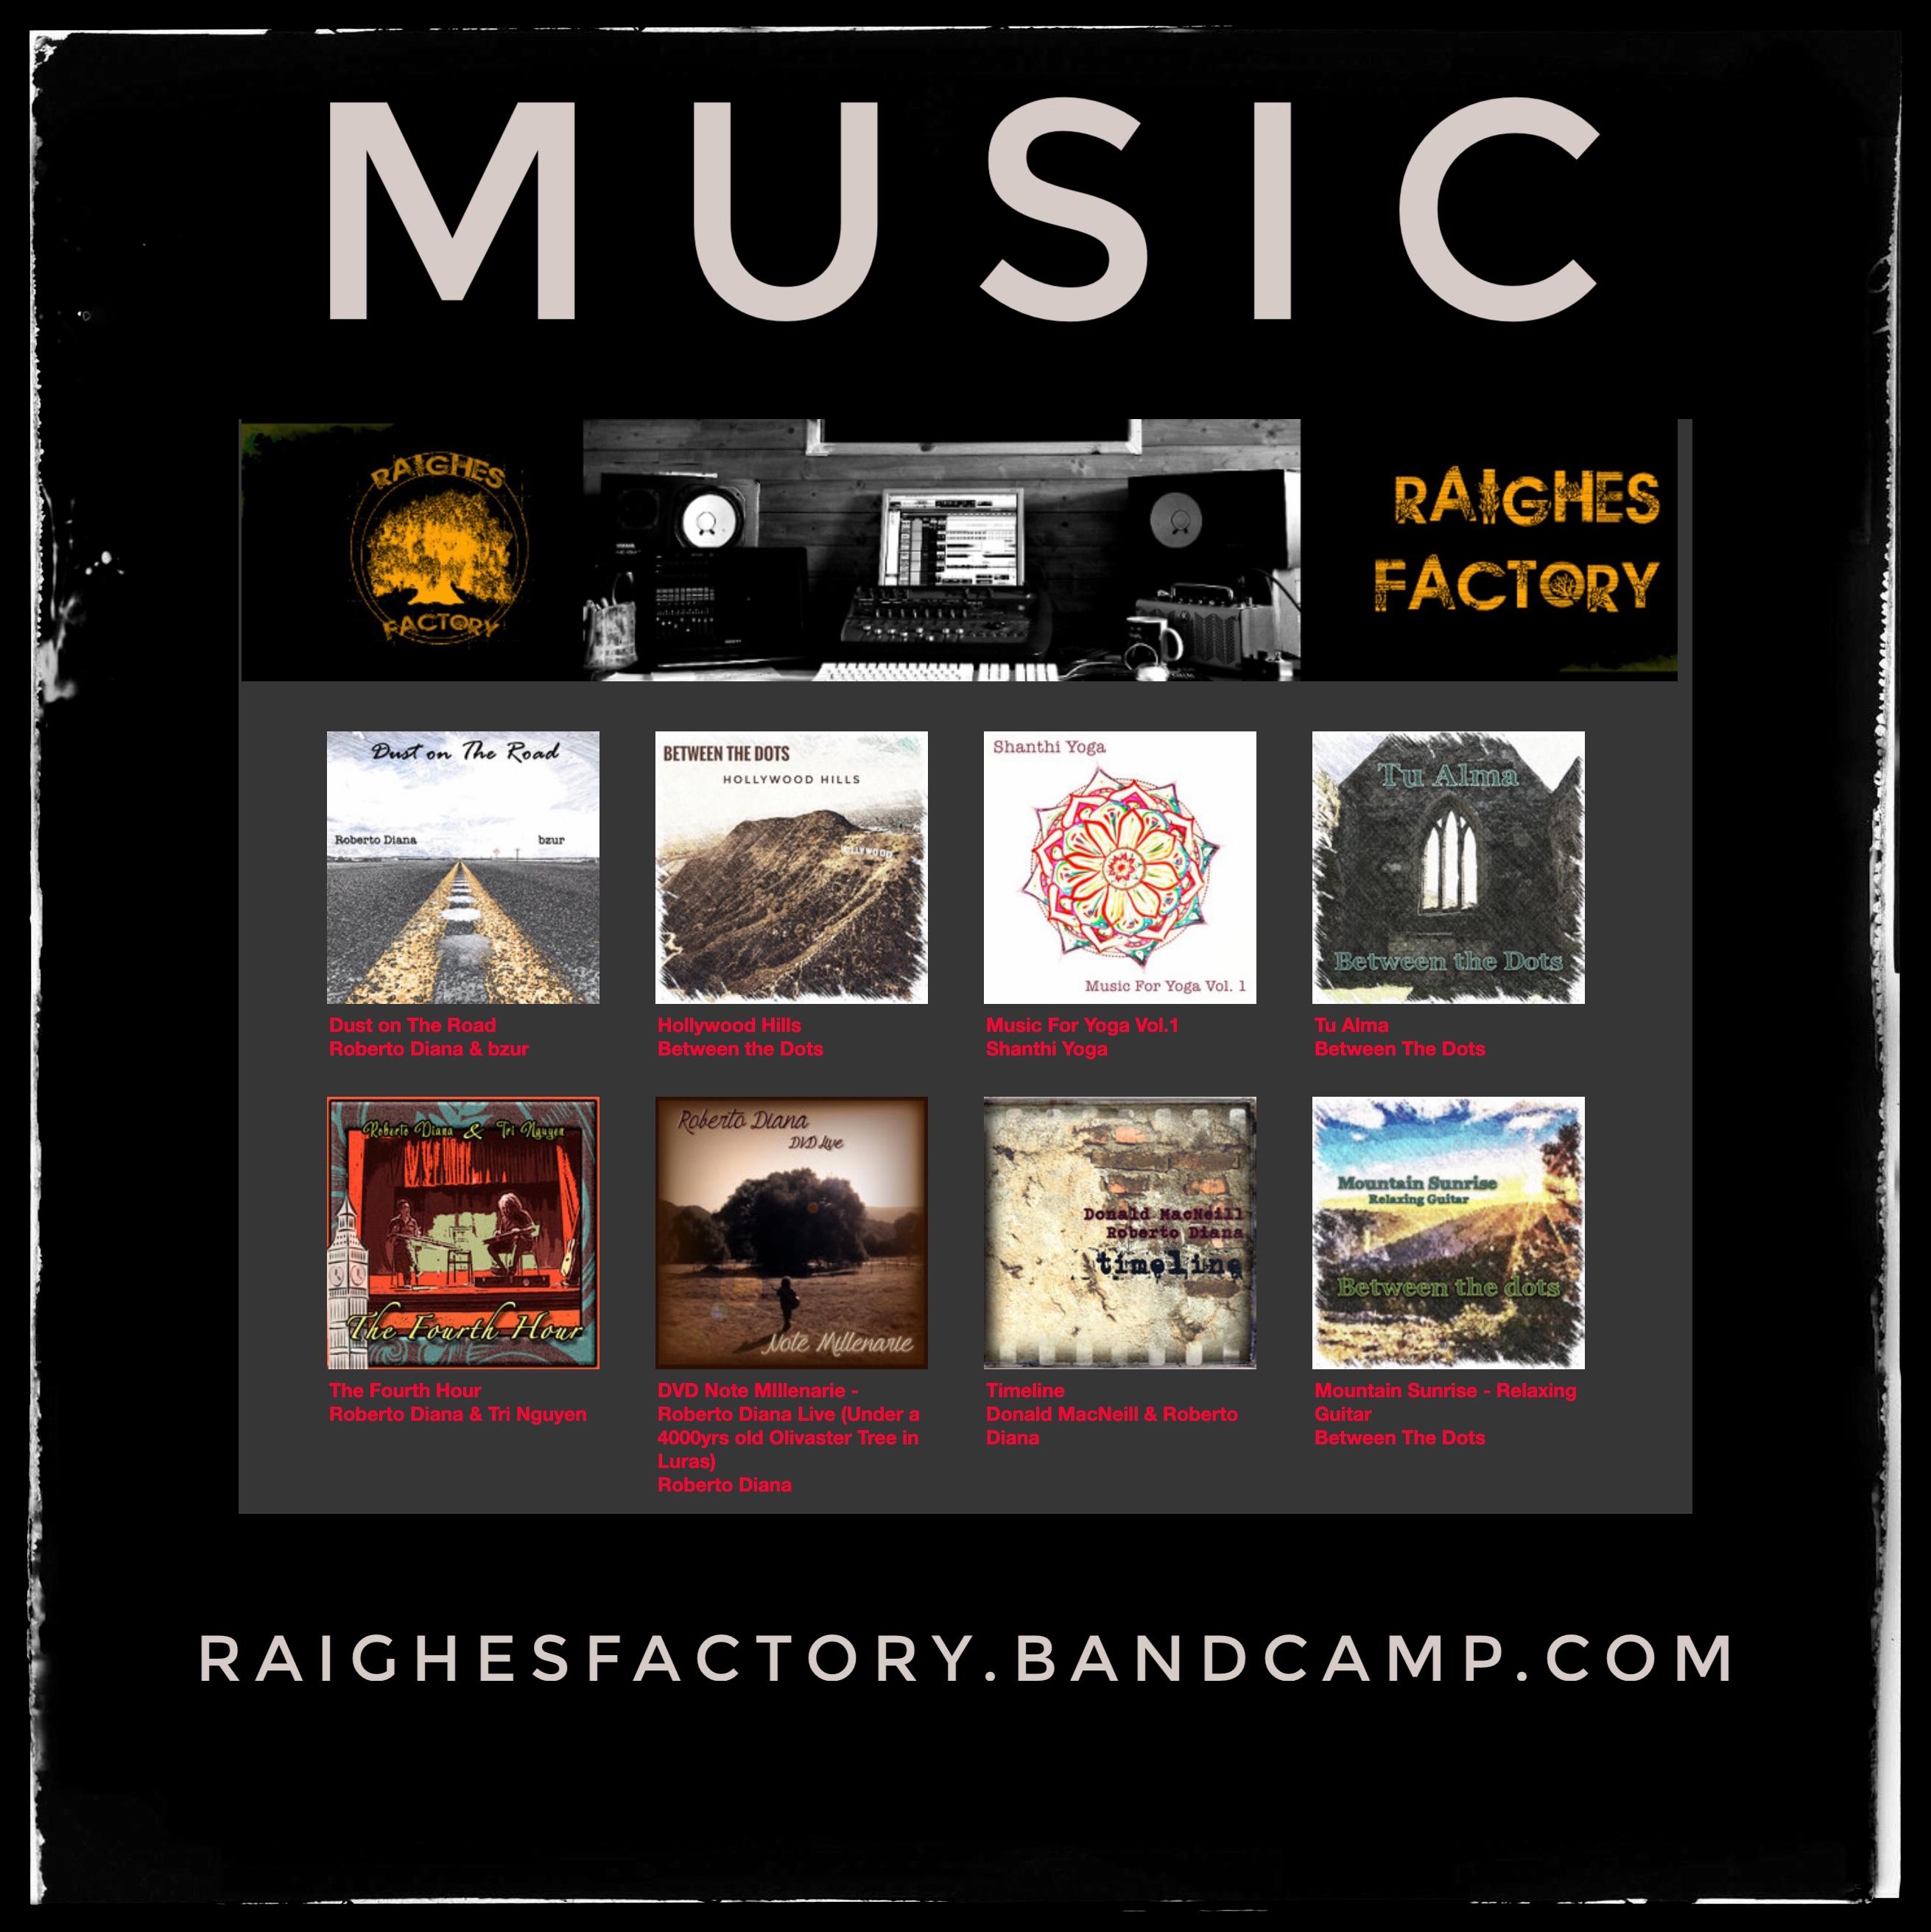 Raighes Factory Music Shop (bandcamp)